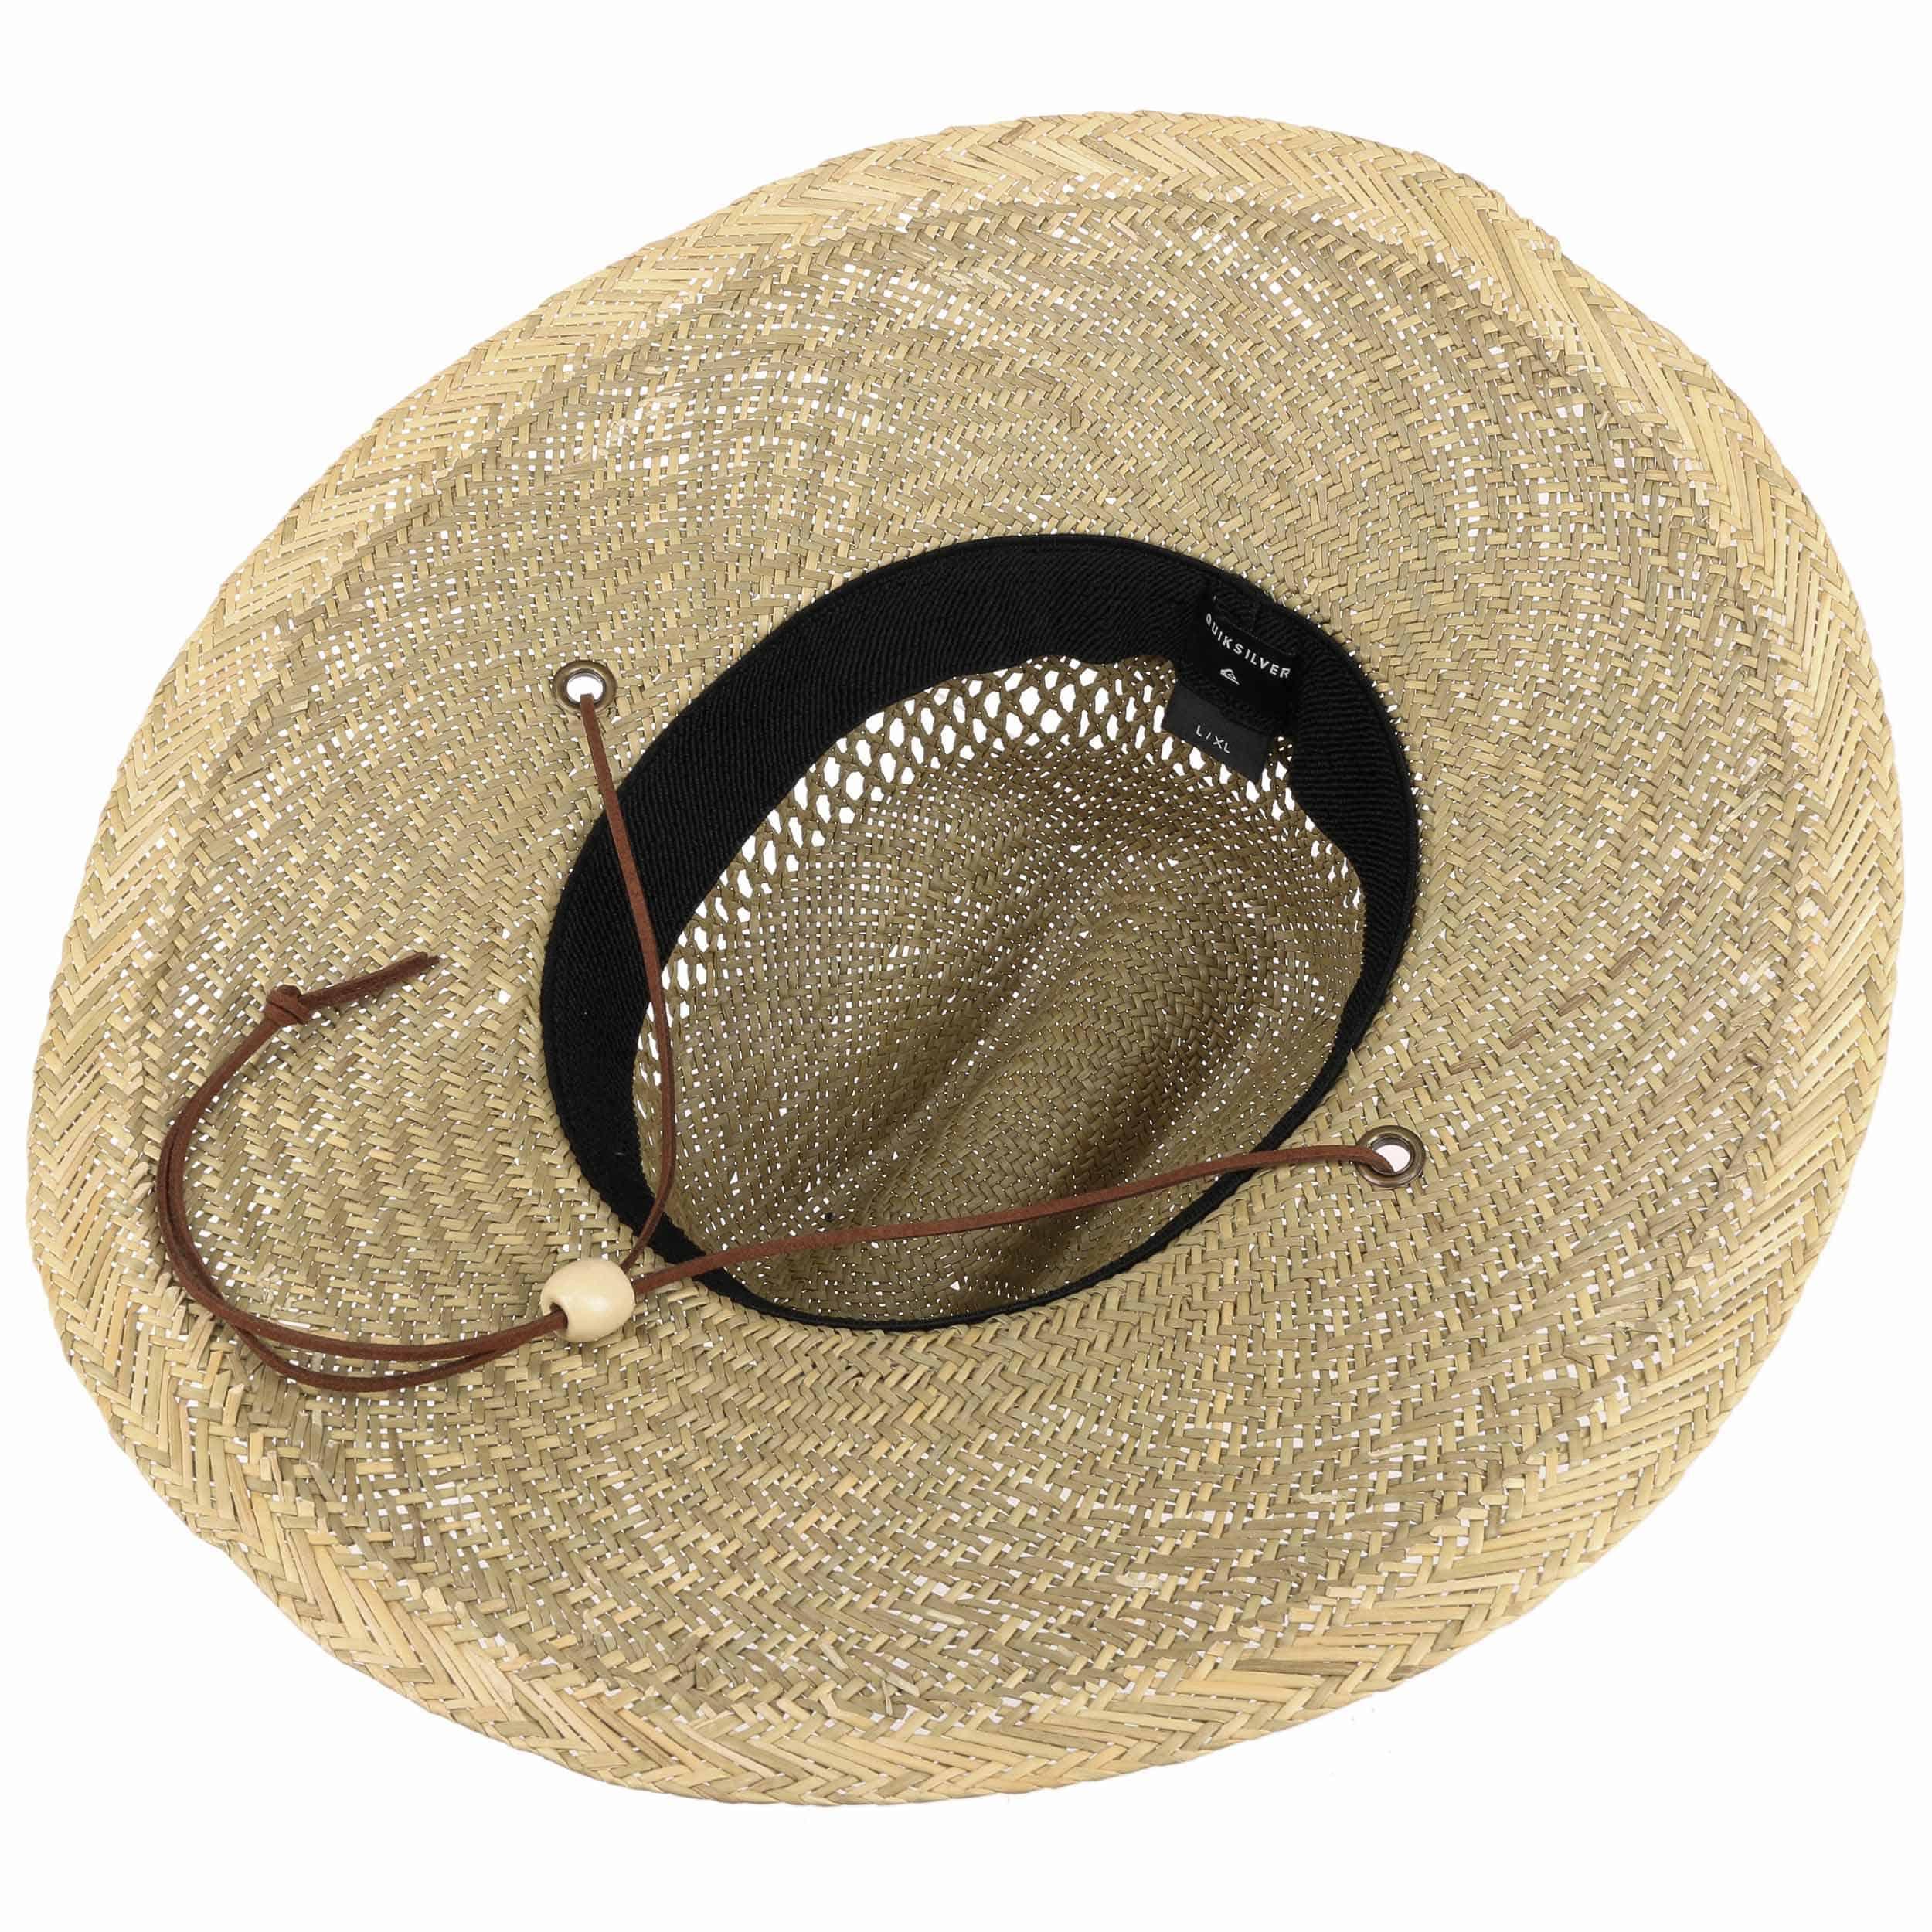 ... Sombrero de Paja Lifeguard Pierside by Quiksilver - natural 2 ... a4f5d21e07b